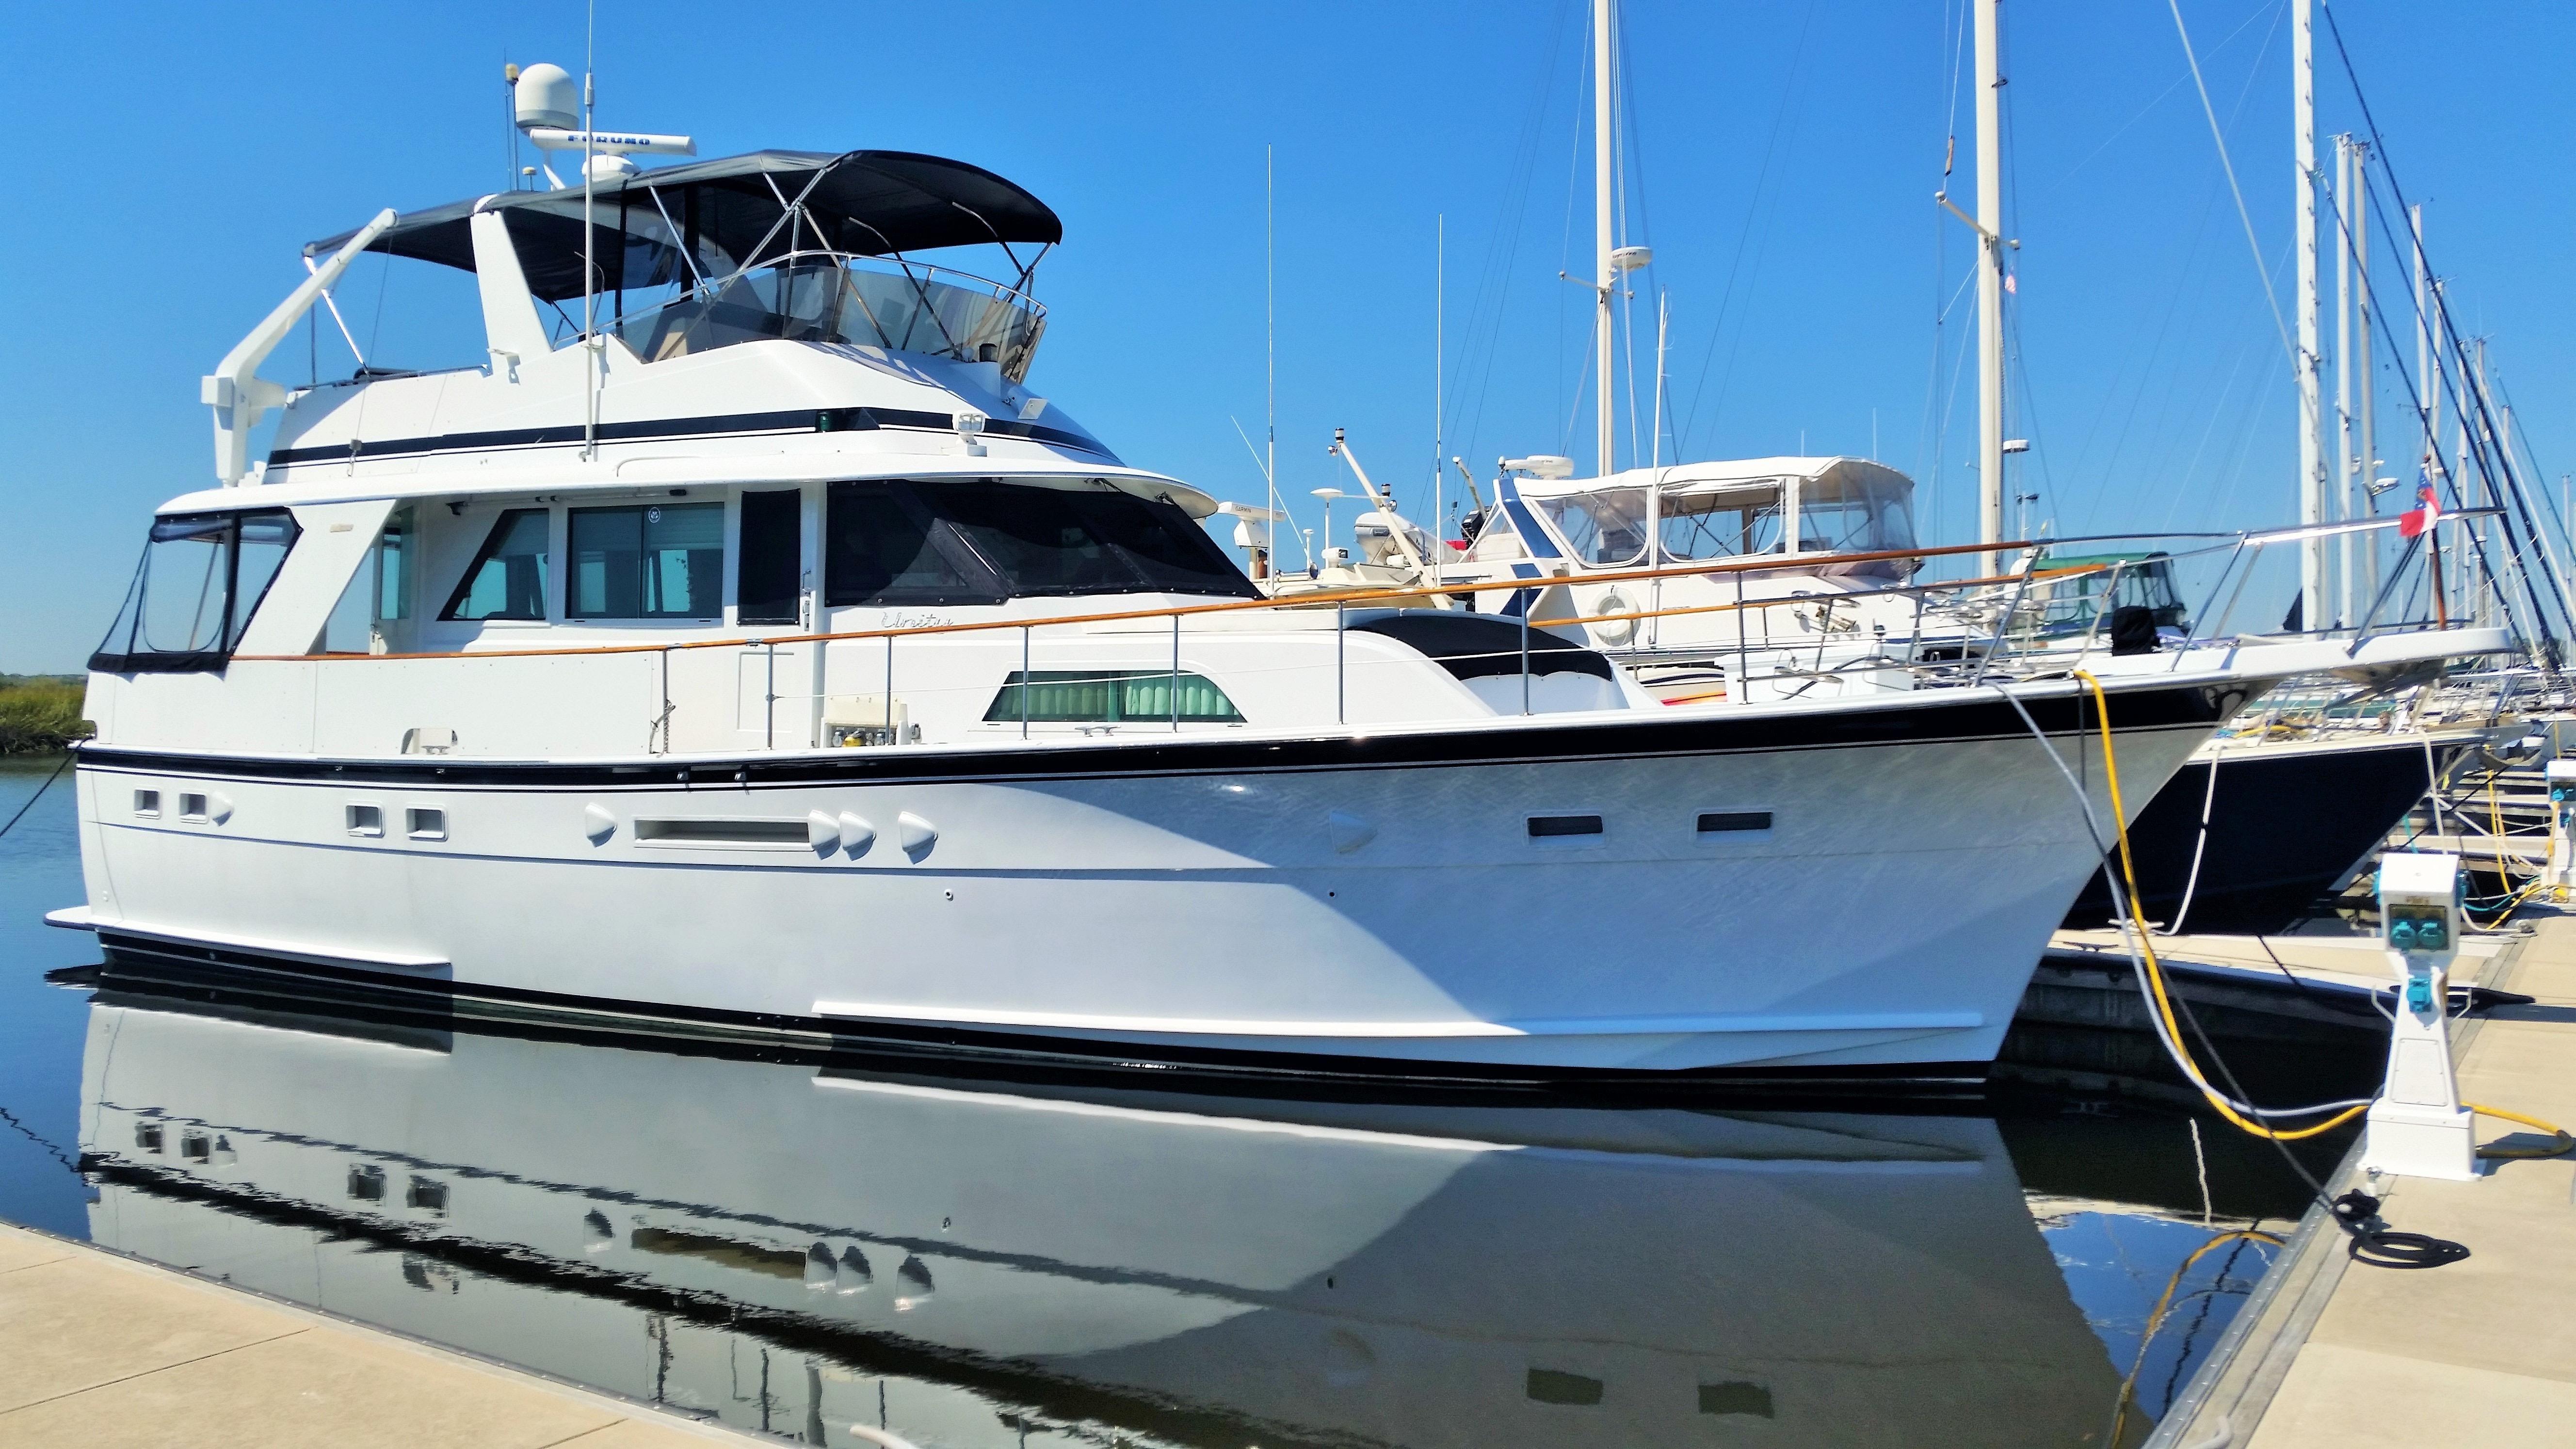 Motor Yacht: 1987 Hatteras 53 Motor Yacht Power Boat For Sale